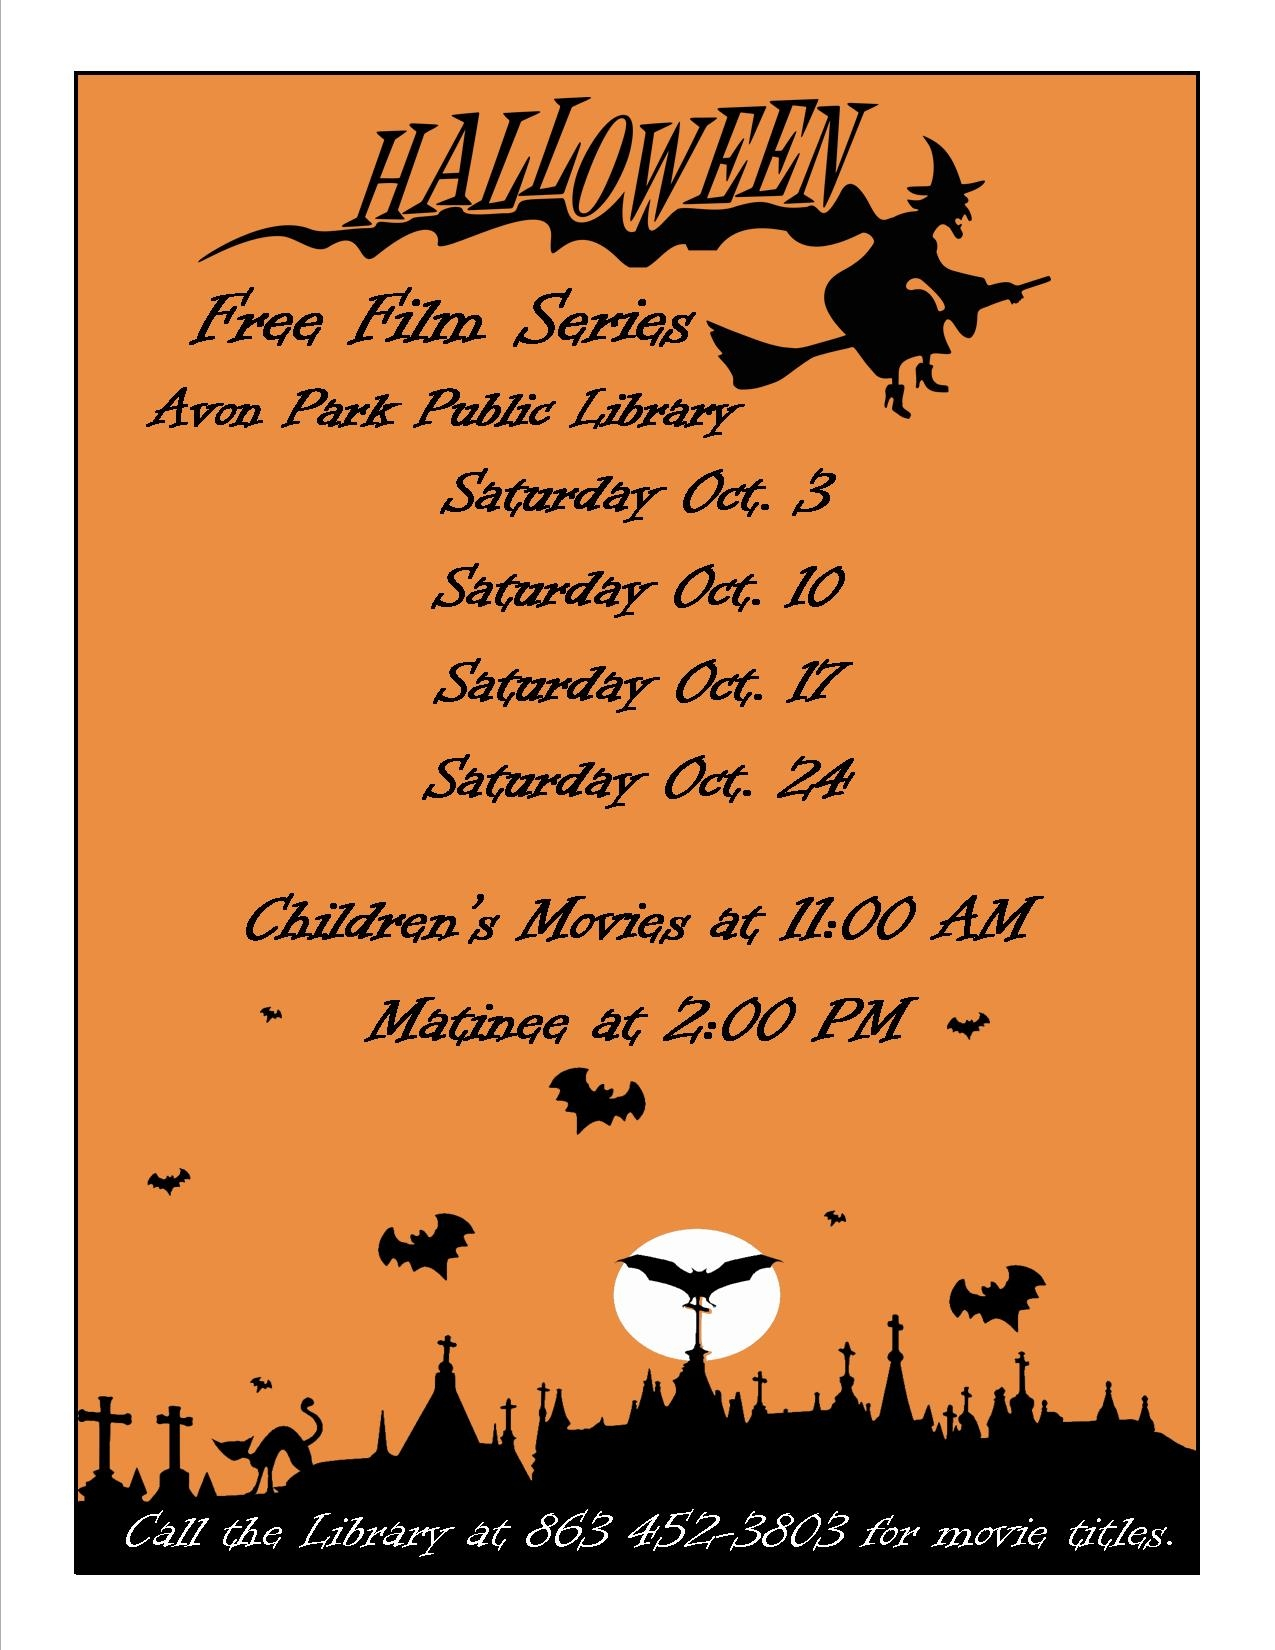 Halloween Free Film Series — Avon Park Library - Heartland